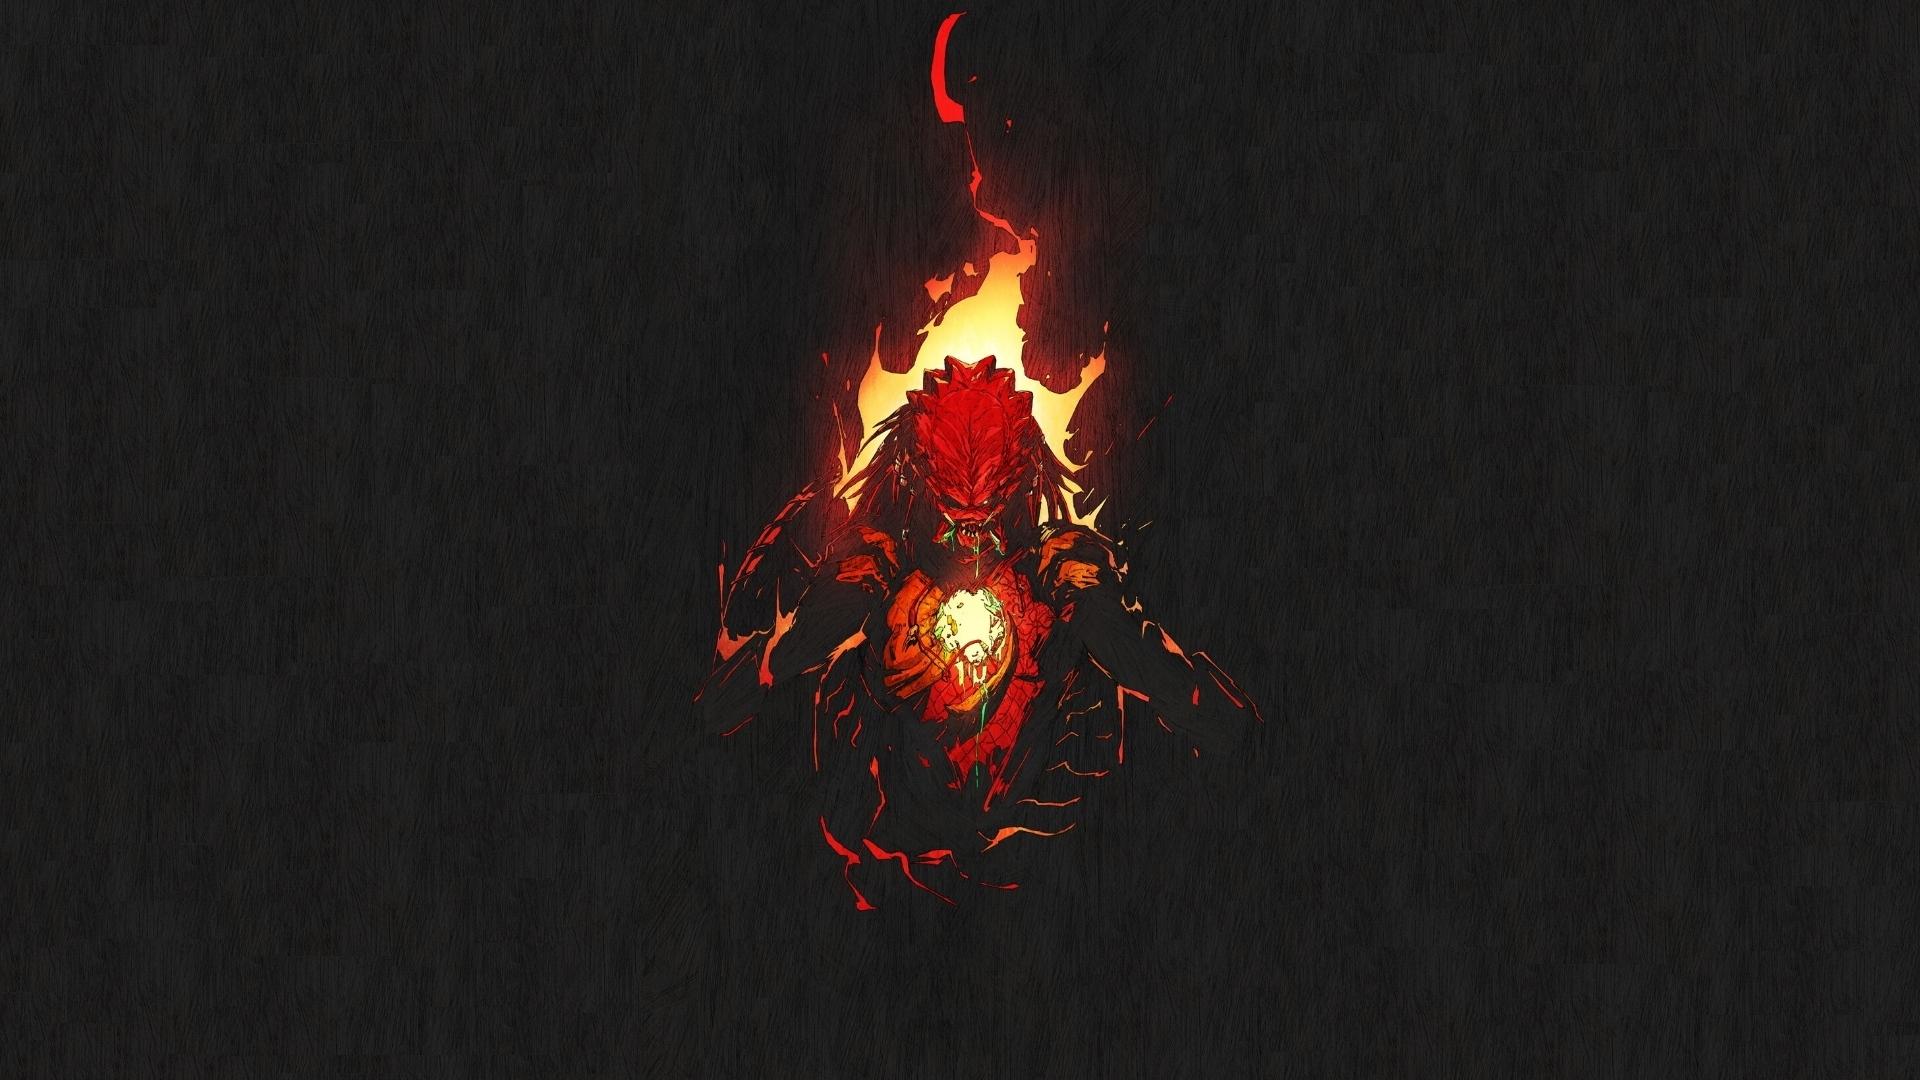 Desktop wallpaper predator digital art dark fire hd image 1920x1080